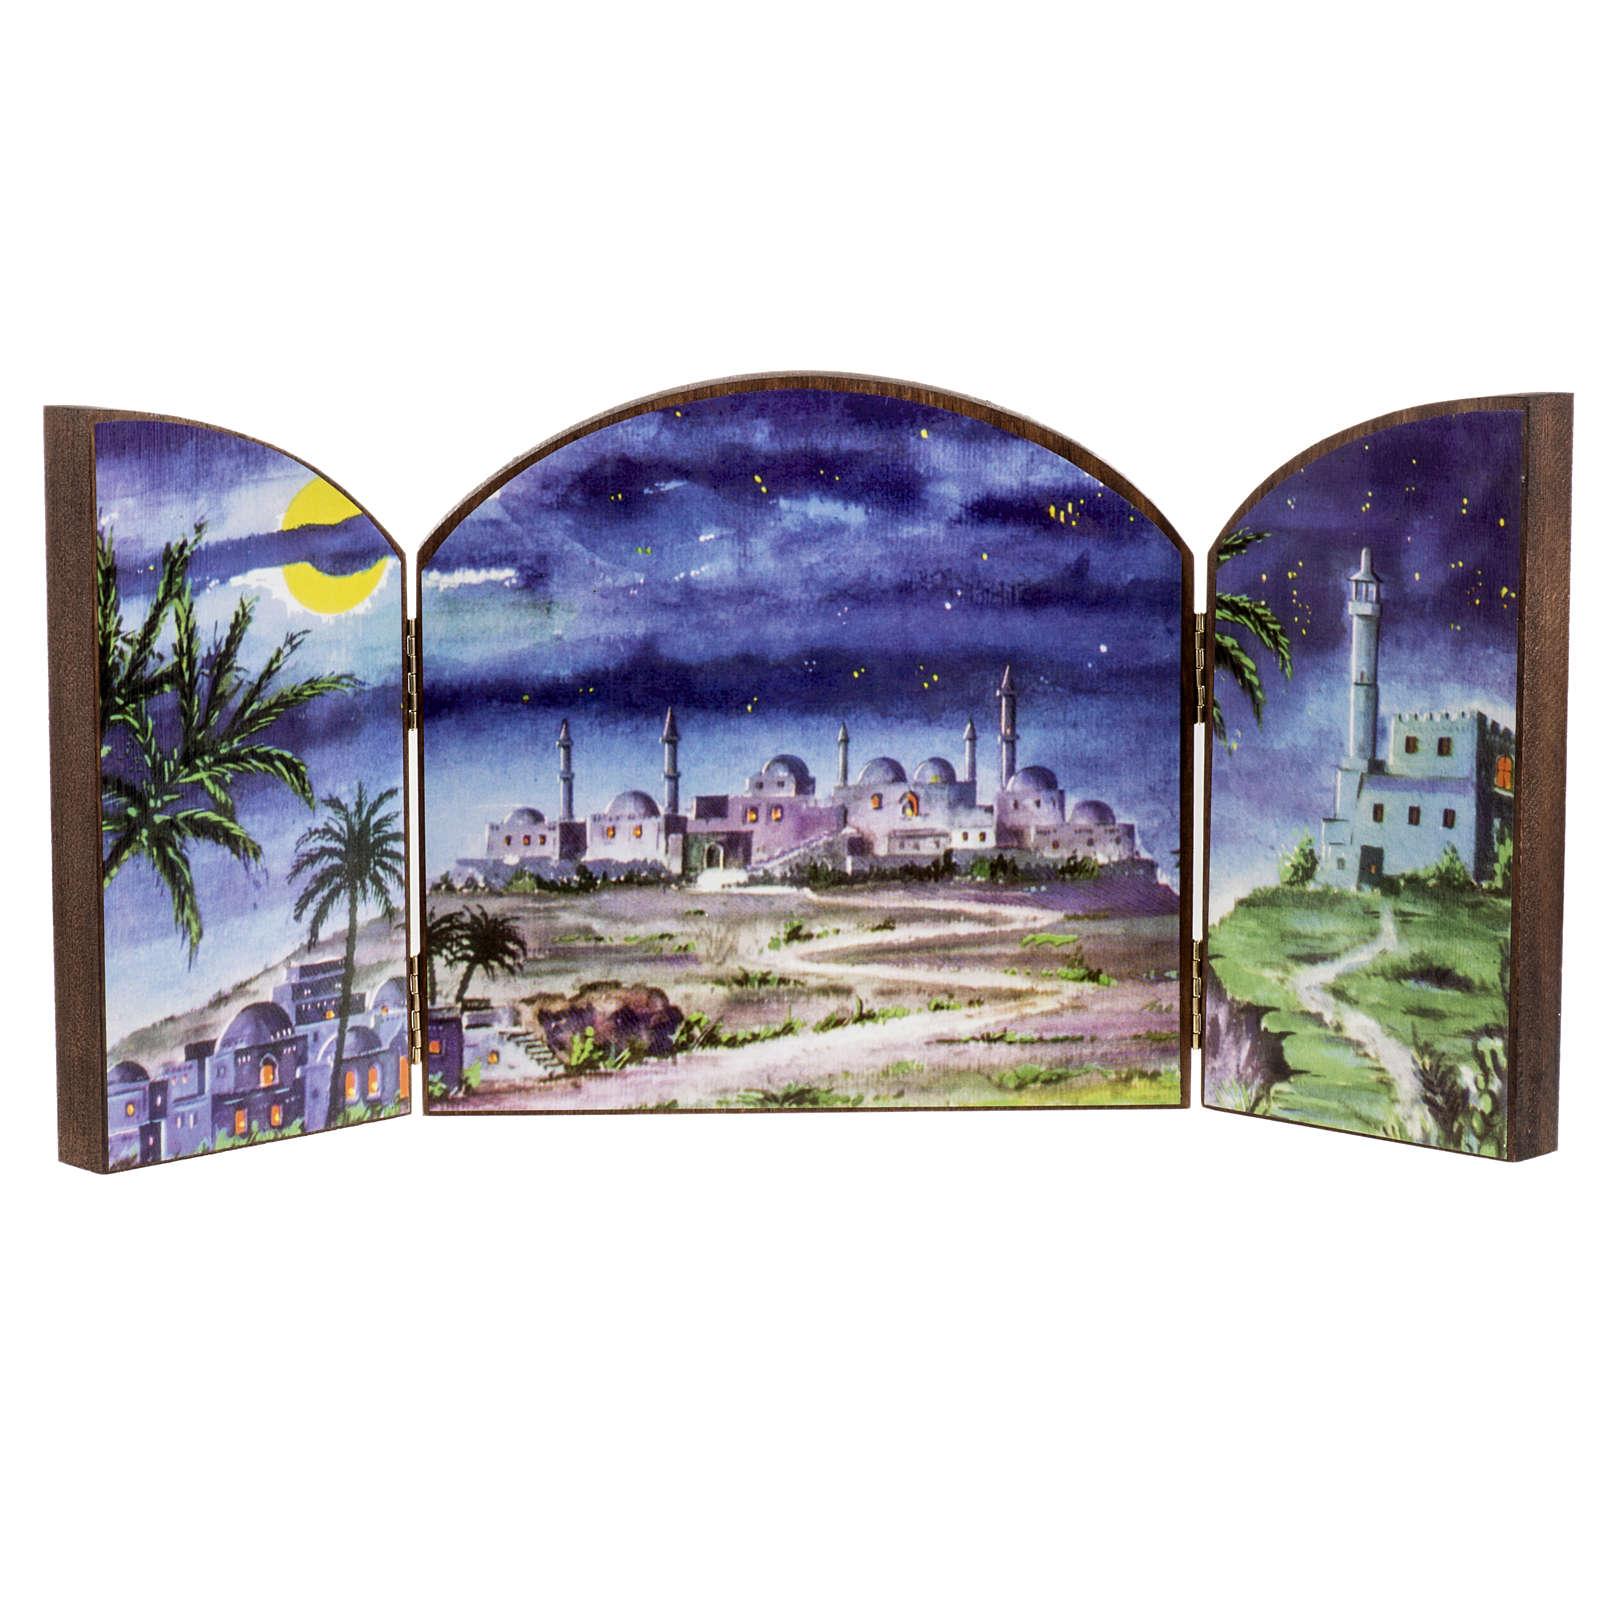 Nativity backdrop, wooden triptych, nativity setting 20x42cm 4